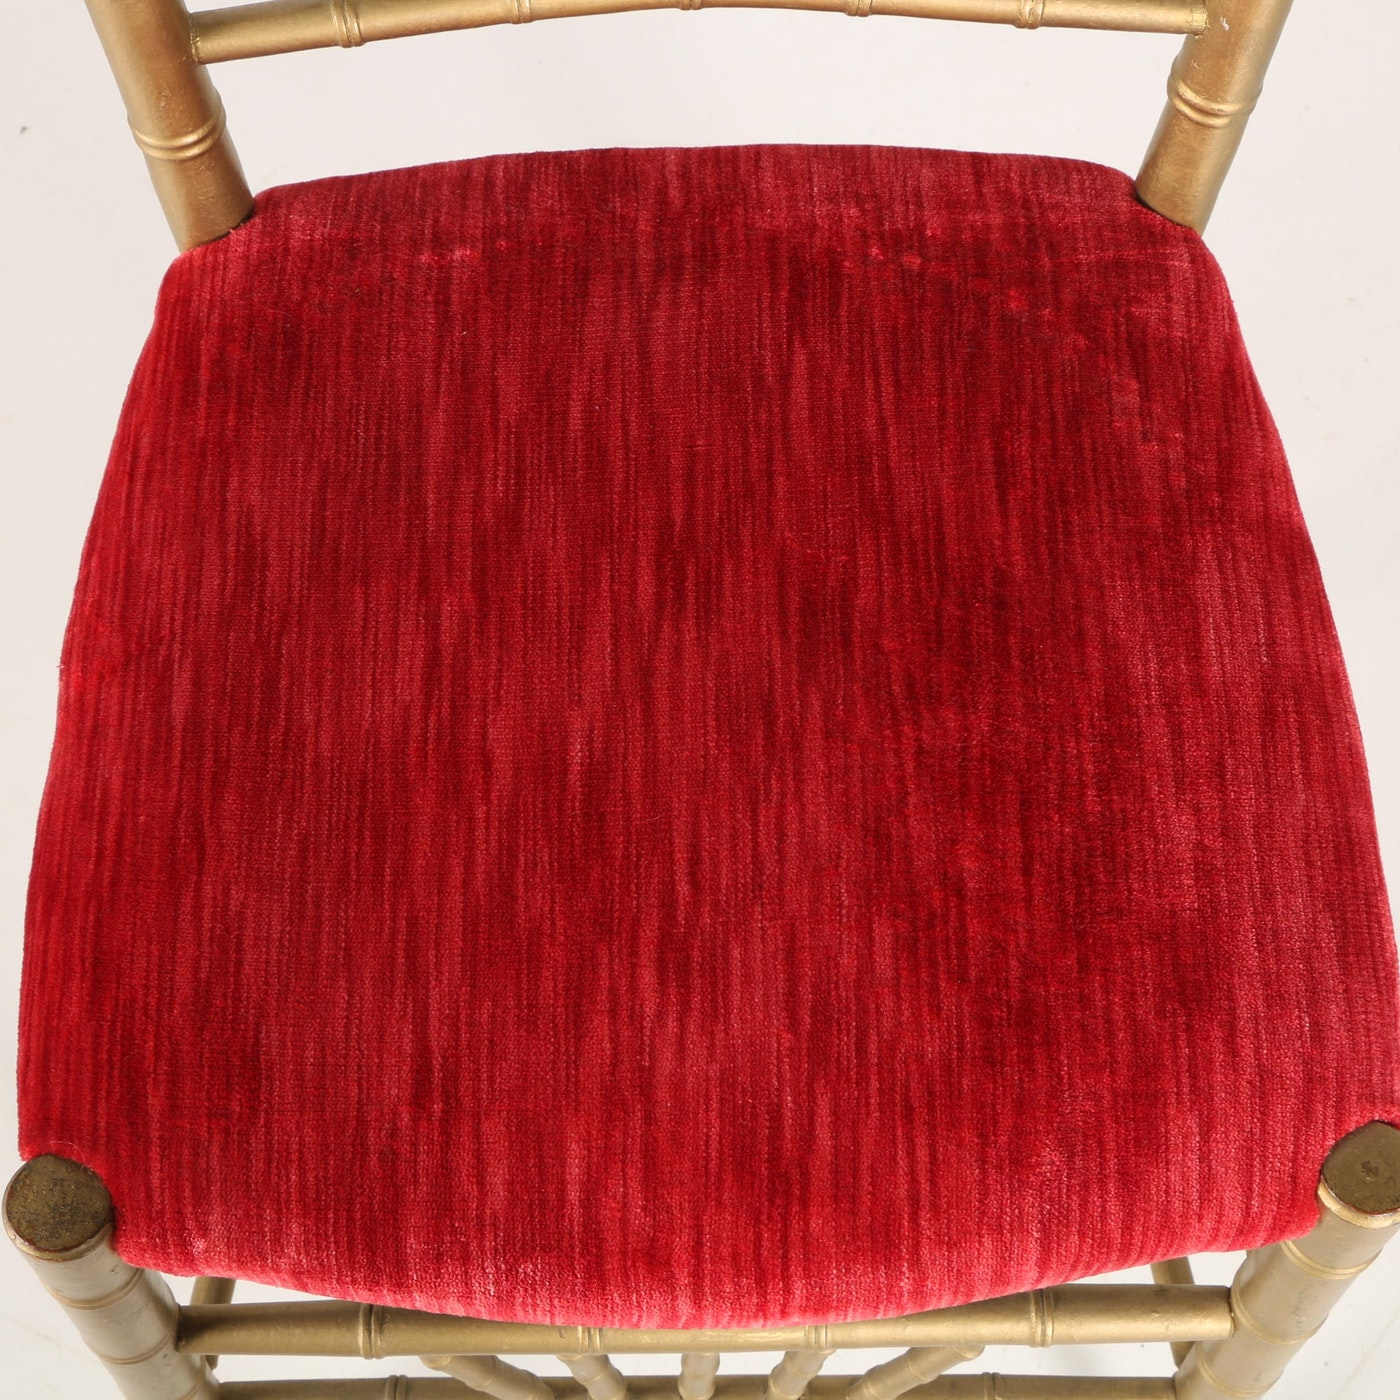 Regency Style Side Chair With Velvet Seat Ebth